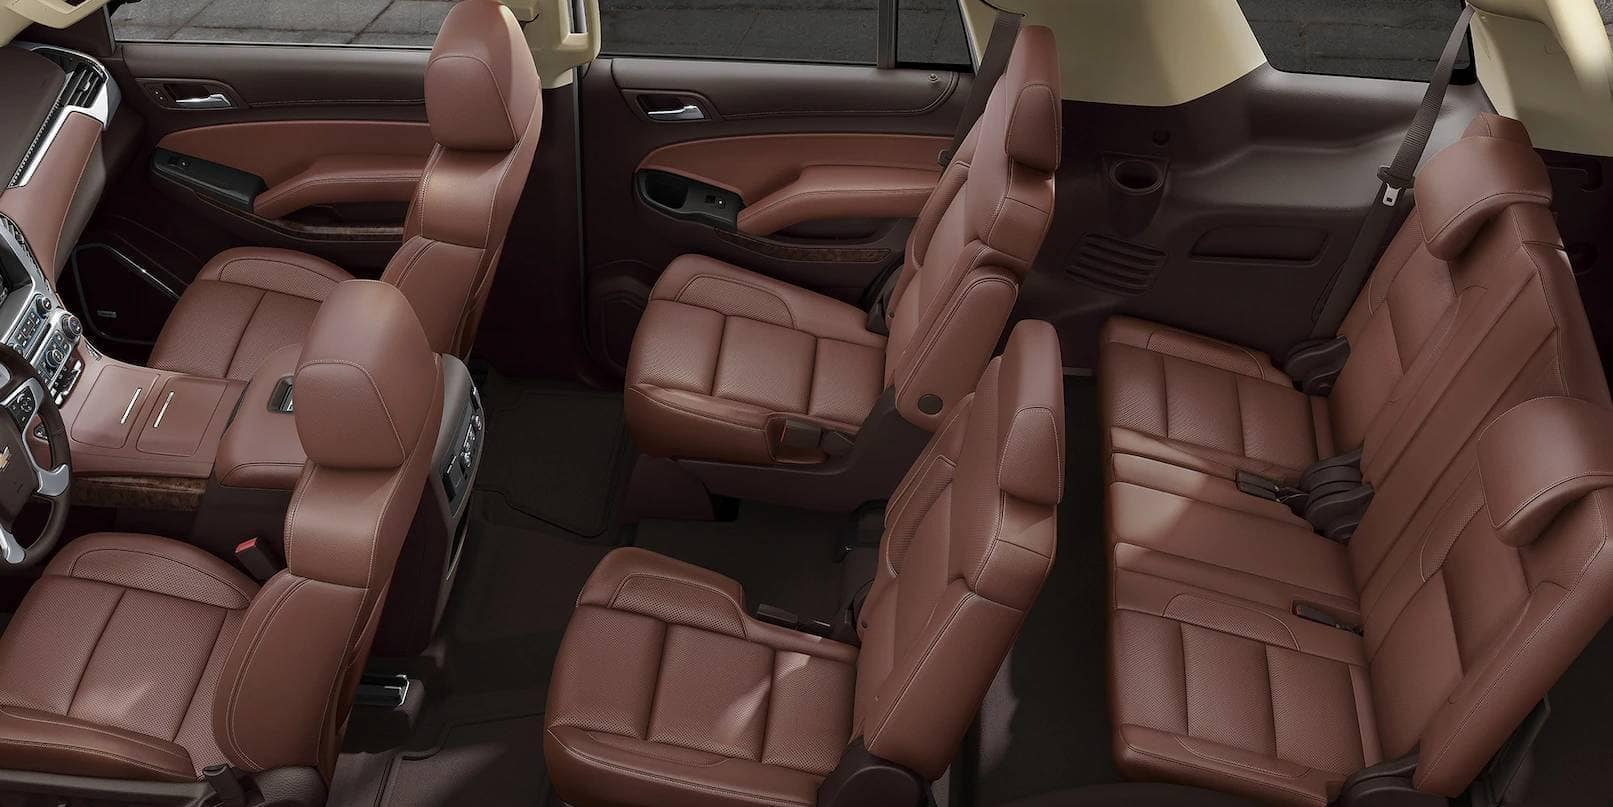 2019 Chevrolet Tahoe seating